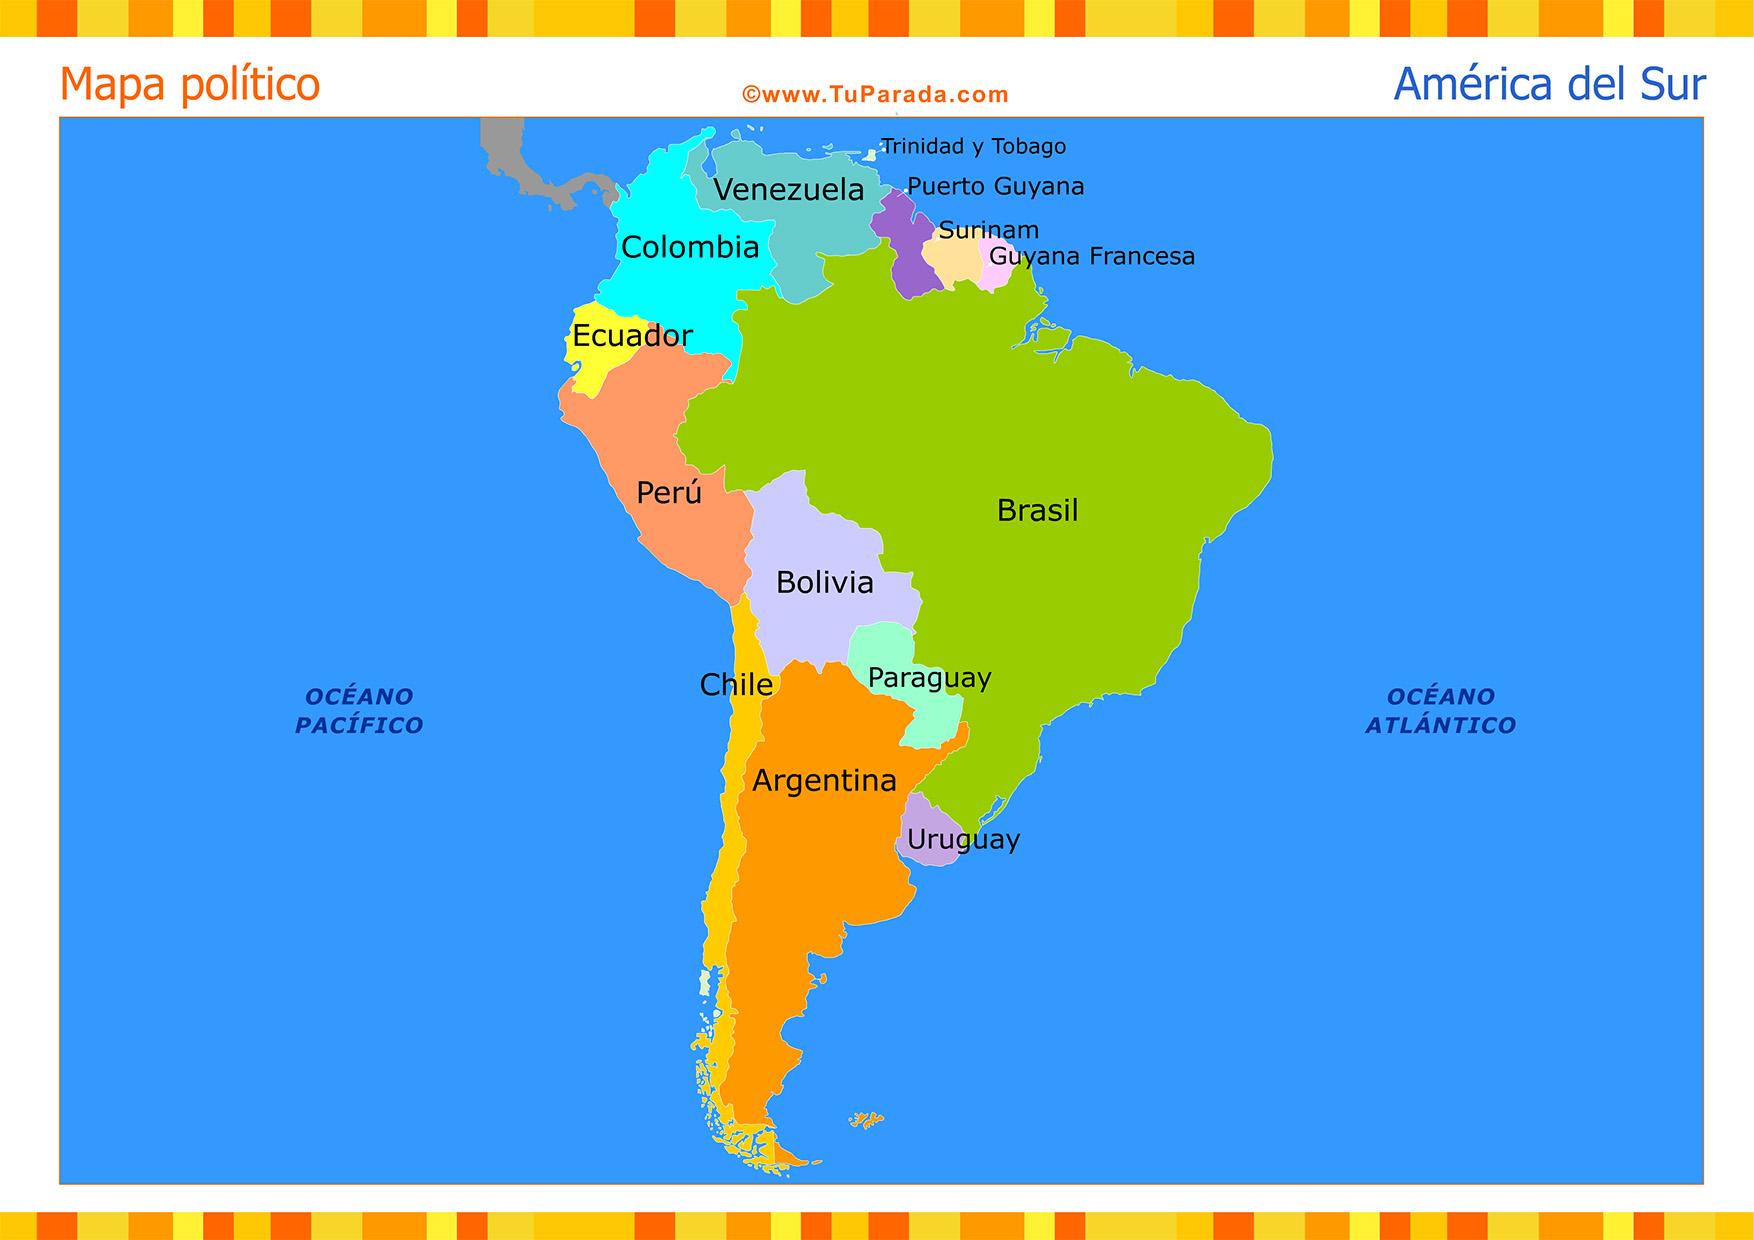 Mapa de Amrica del Sur poltico Mapas tarjetas